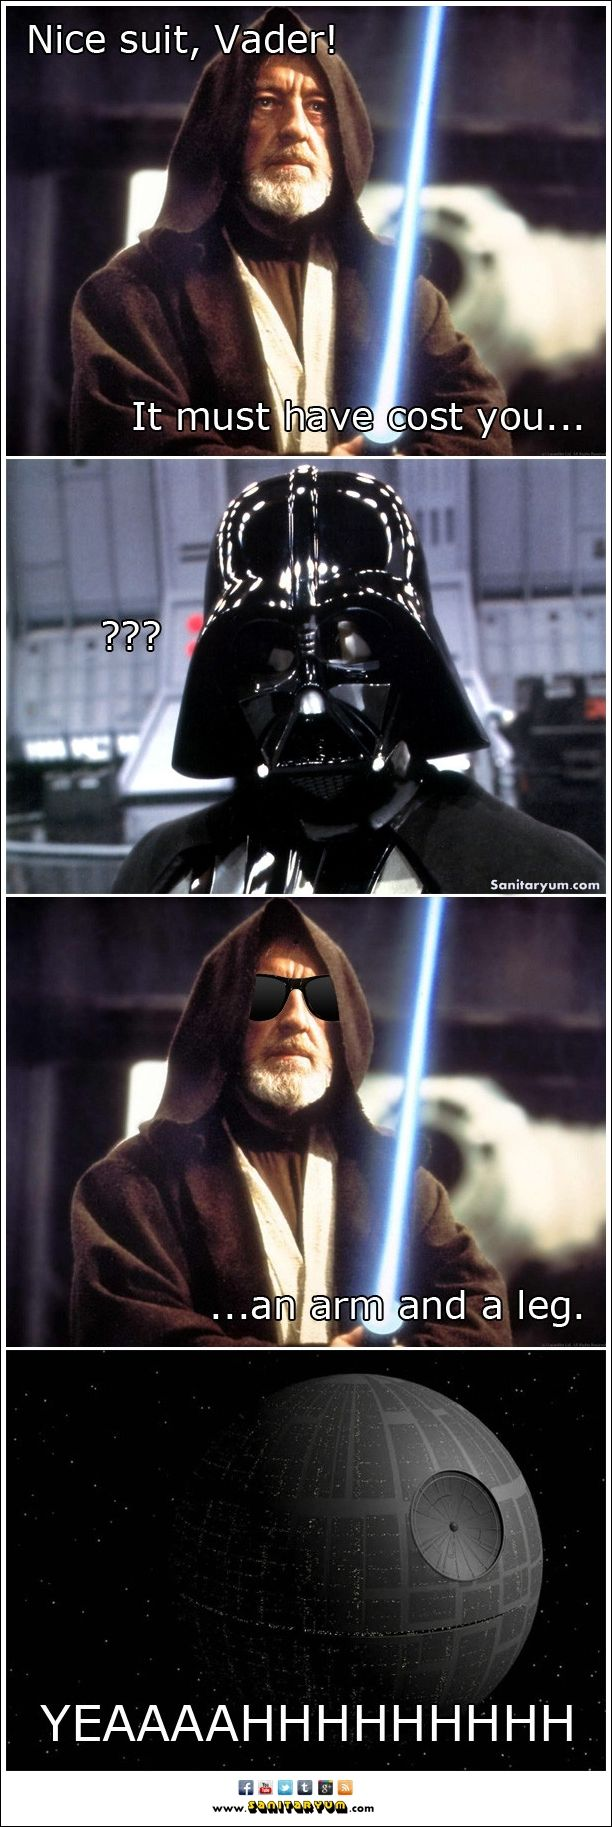 Pin By Alaina Donnell On Geektacular Star Wars Jokes Star Wars Humor Star Wars Memes